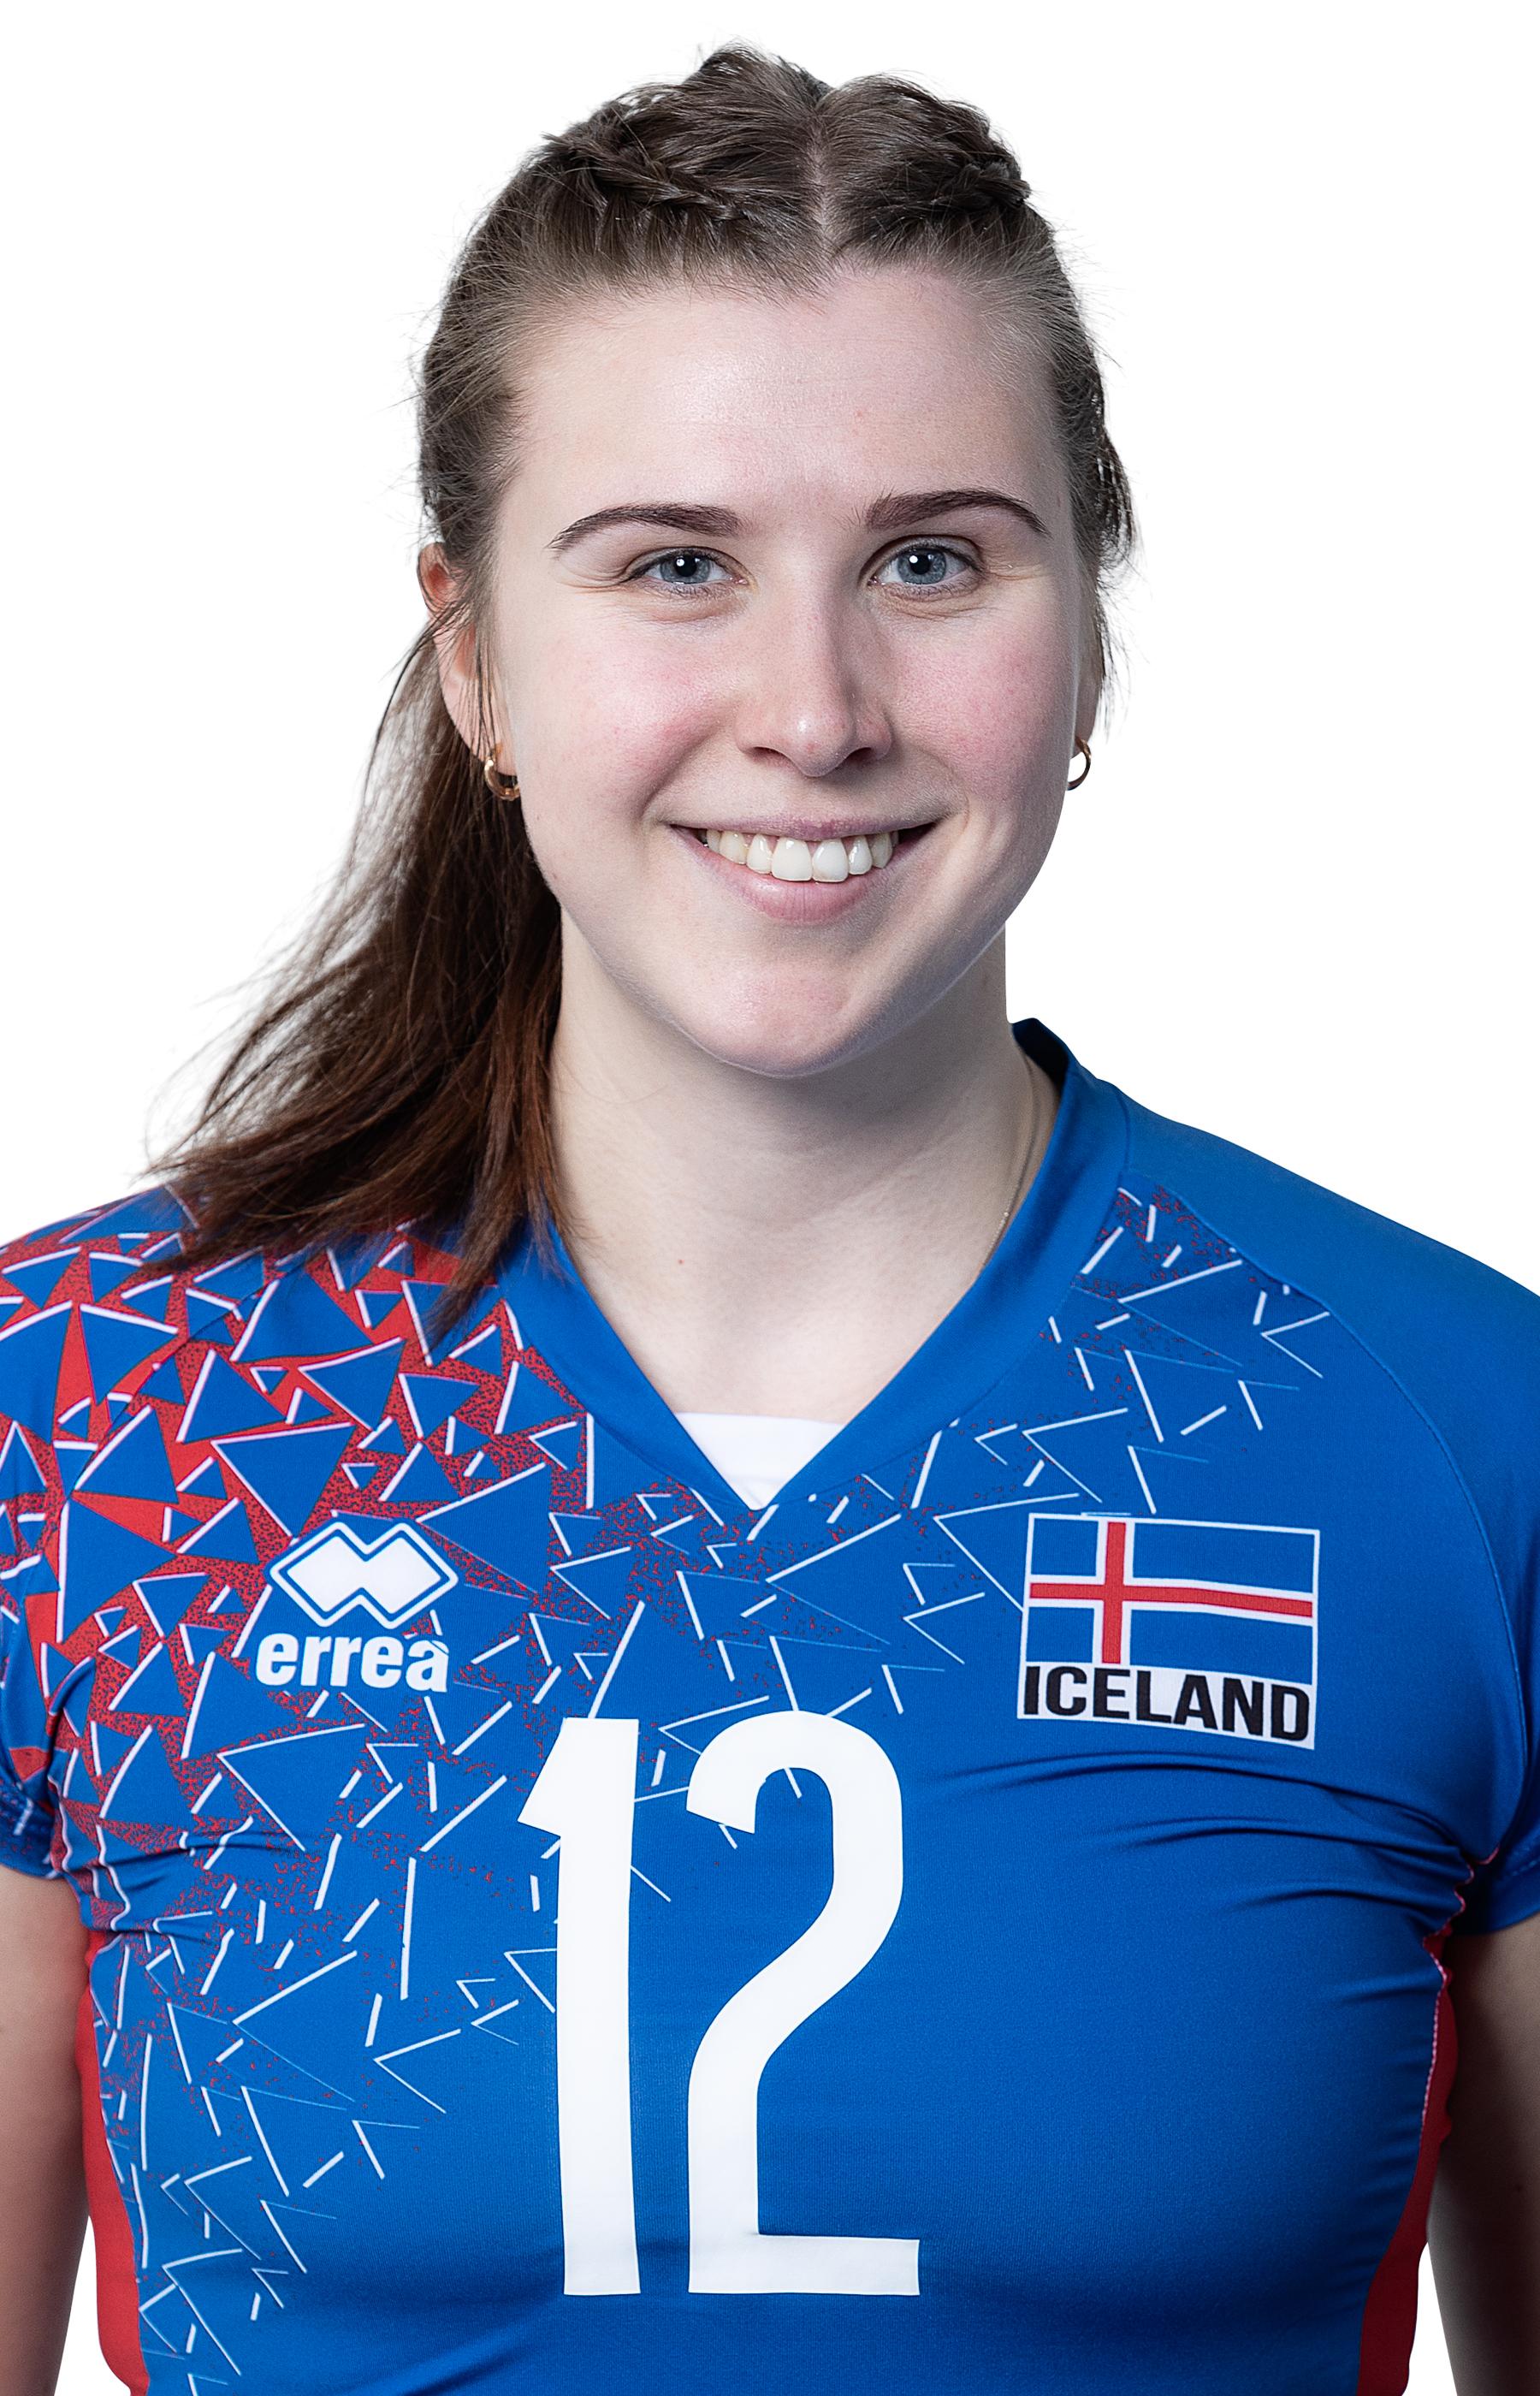 Photo of Thelma Dögg GRÉTARSDÓTTIR